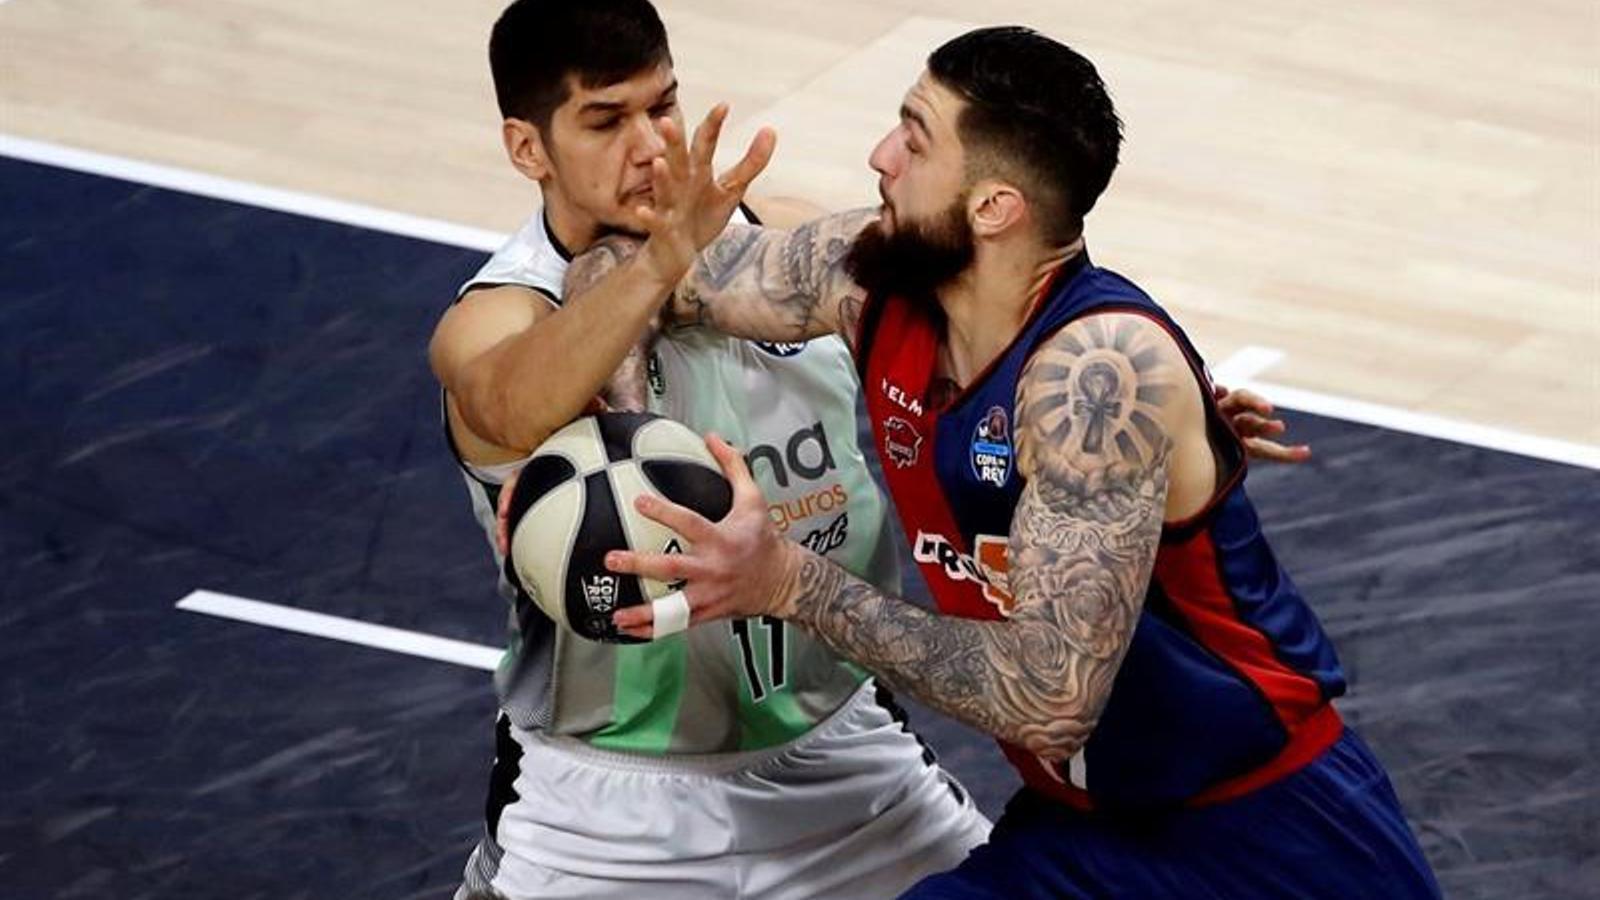 Marko Todorovic i Vincet Poirier